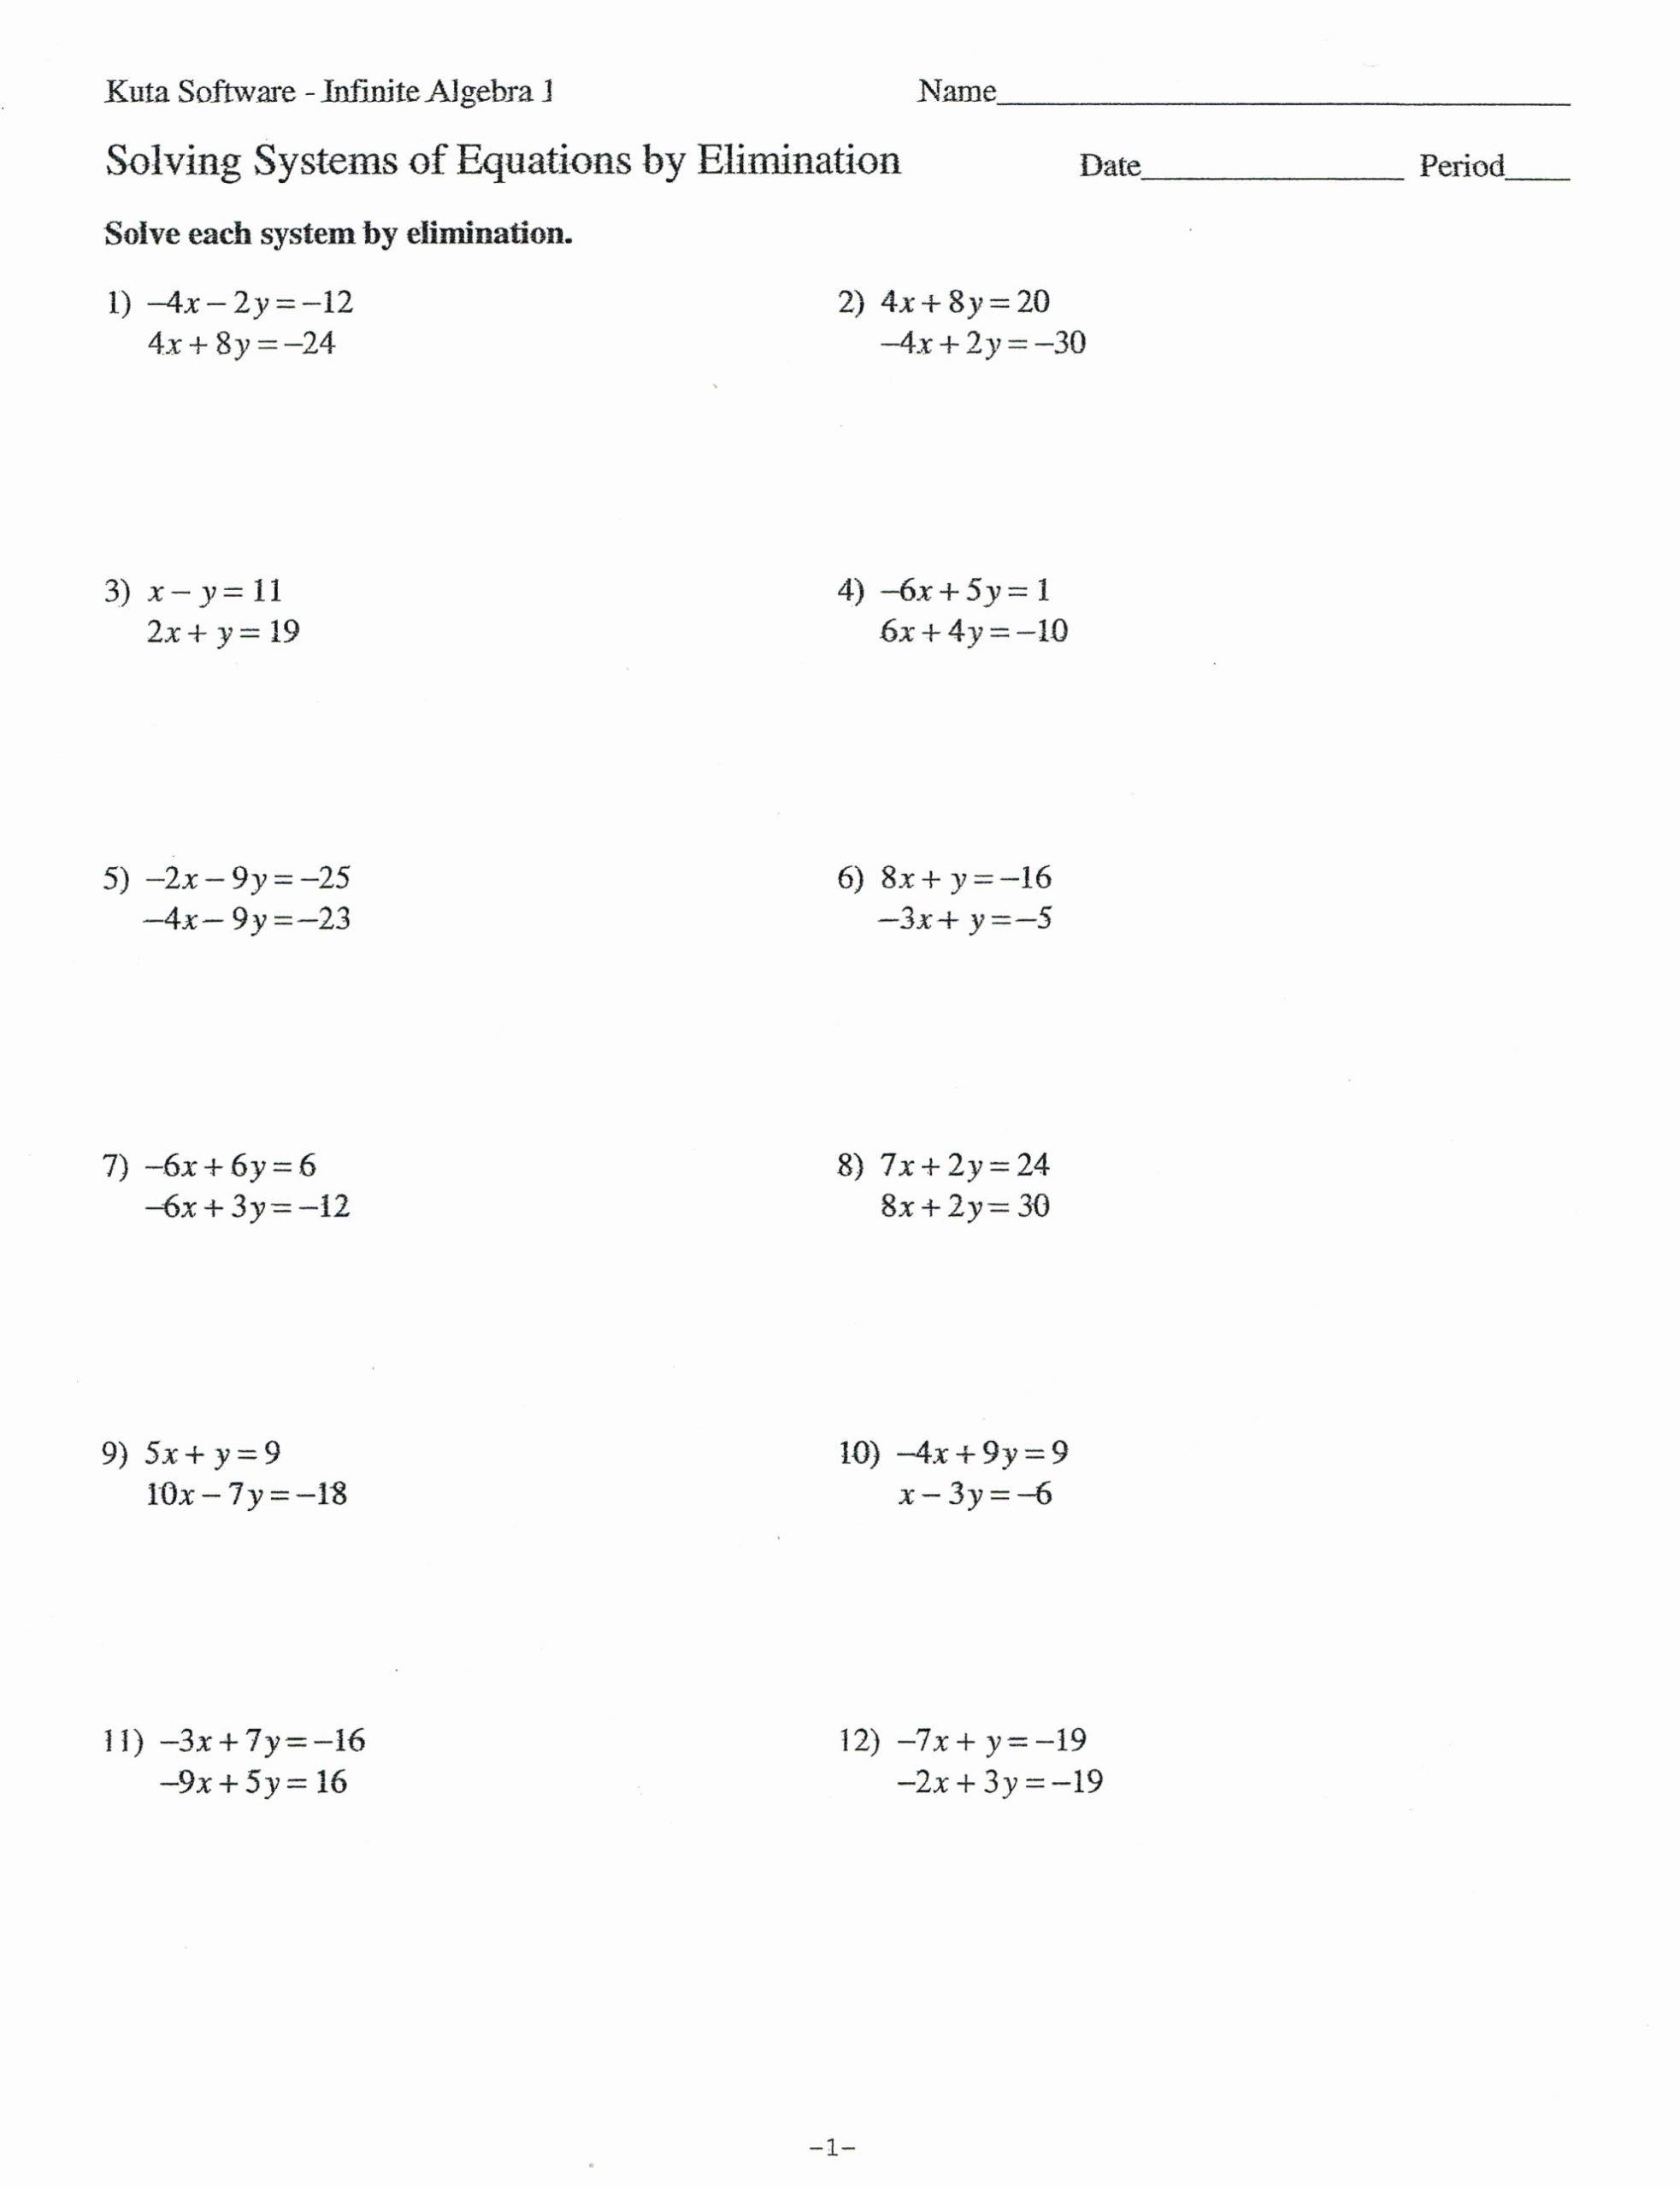 Distributive Property Worksheets 7th Grade Lovely Using the Distributive Property Worksheet